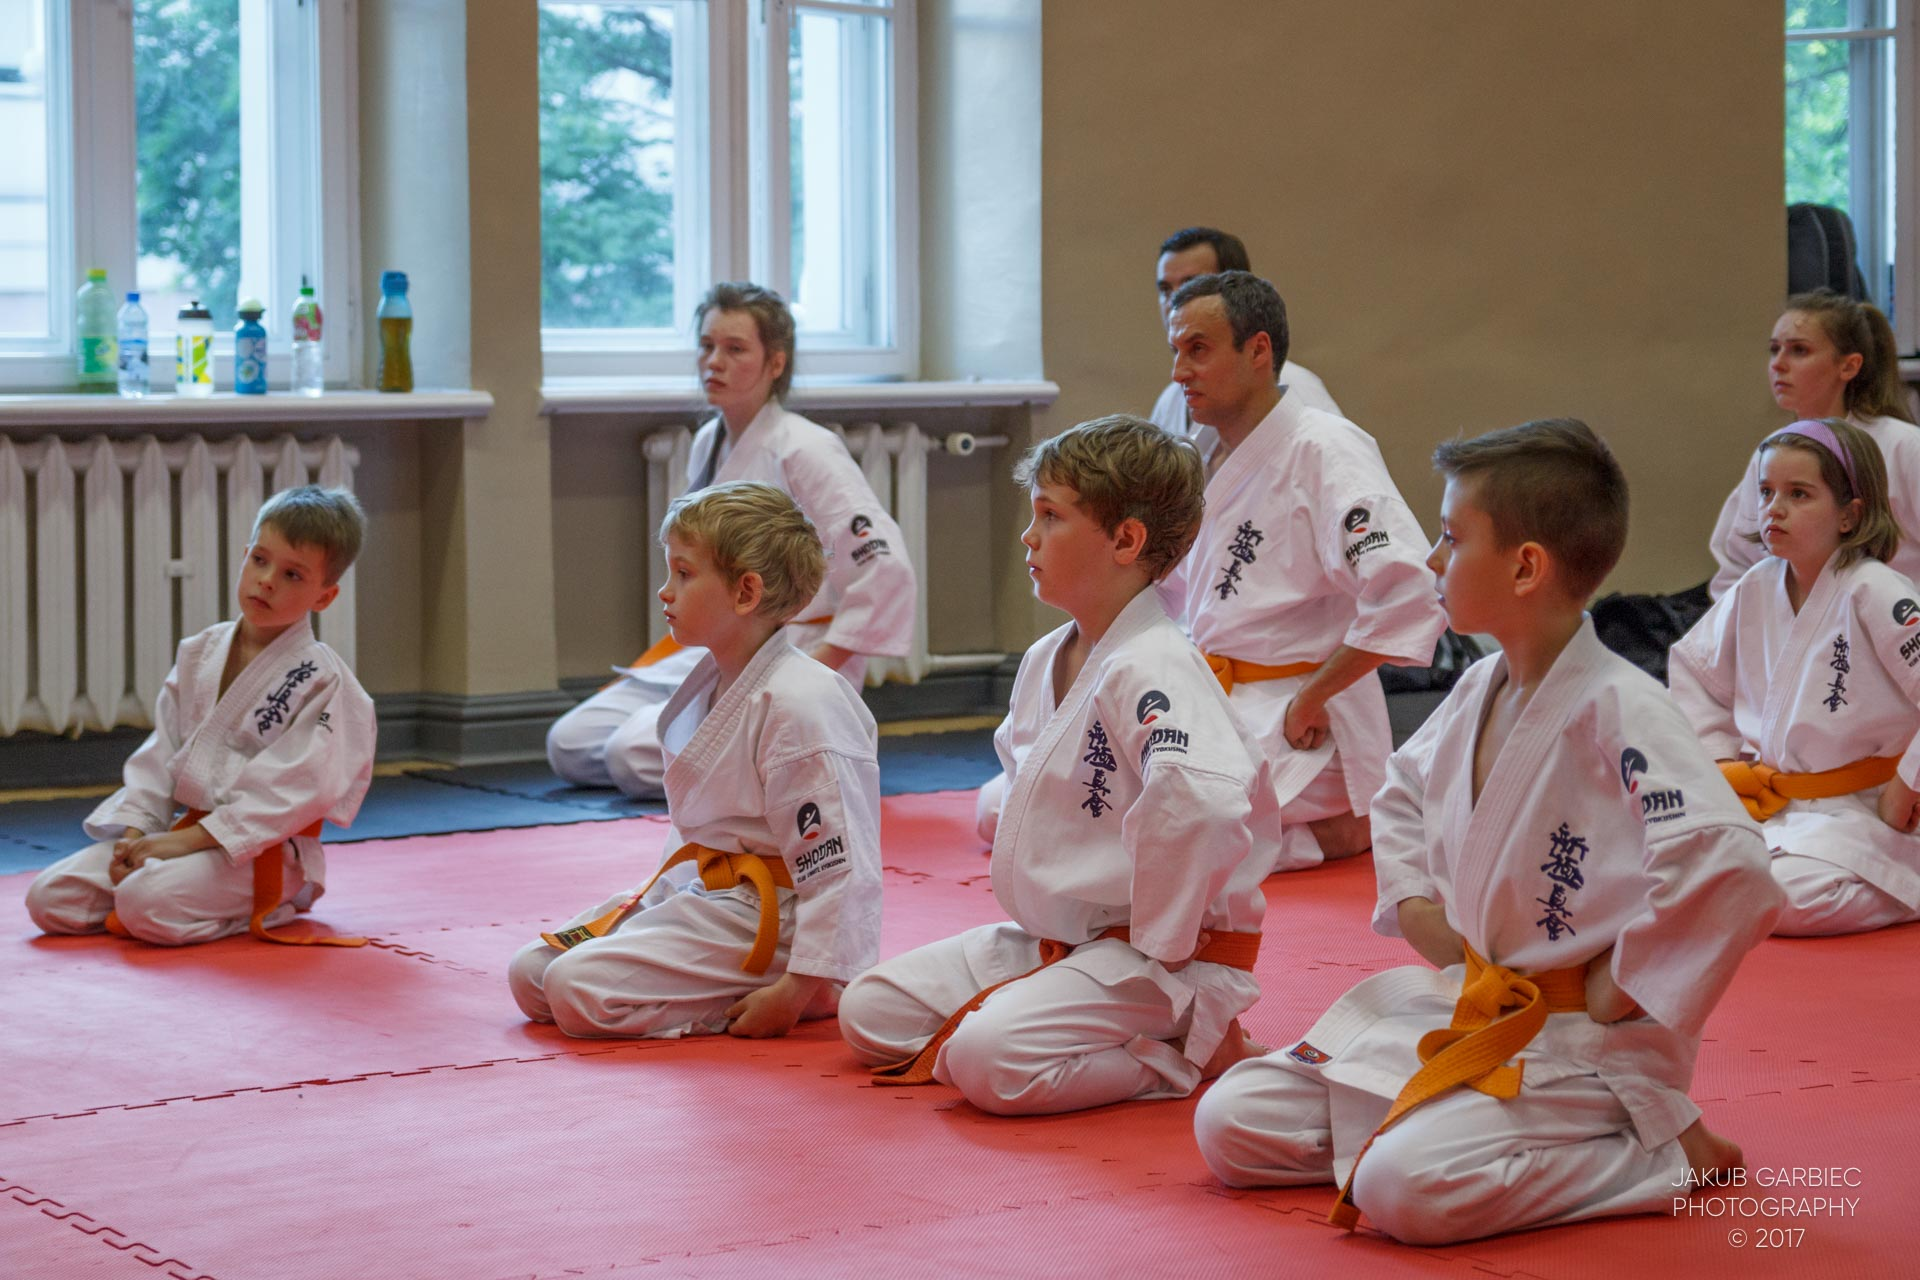 egzamin-karate-mistrz-mariusz-mazur-klub-karate-shodan-2017-06-02-32